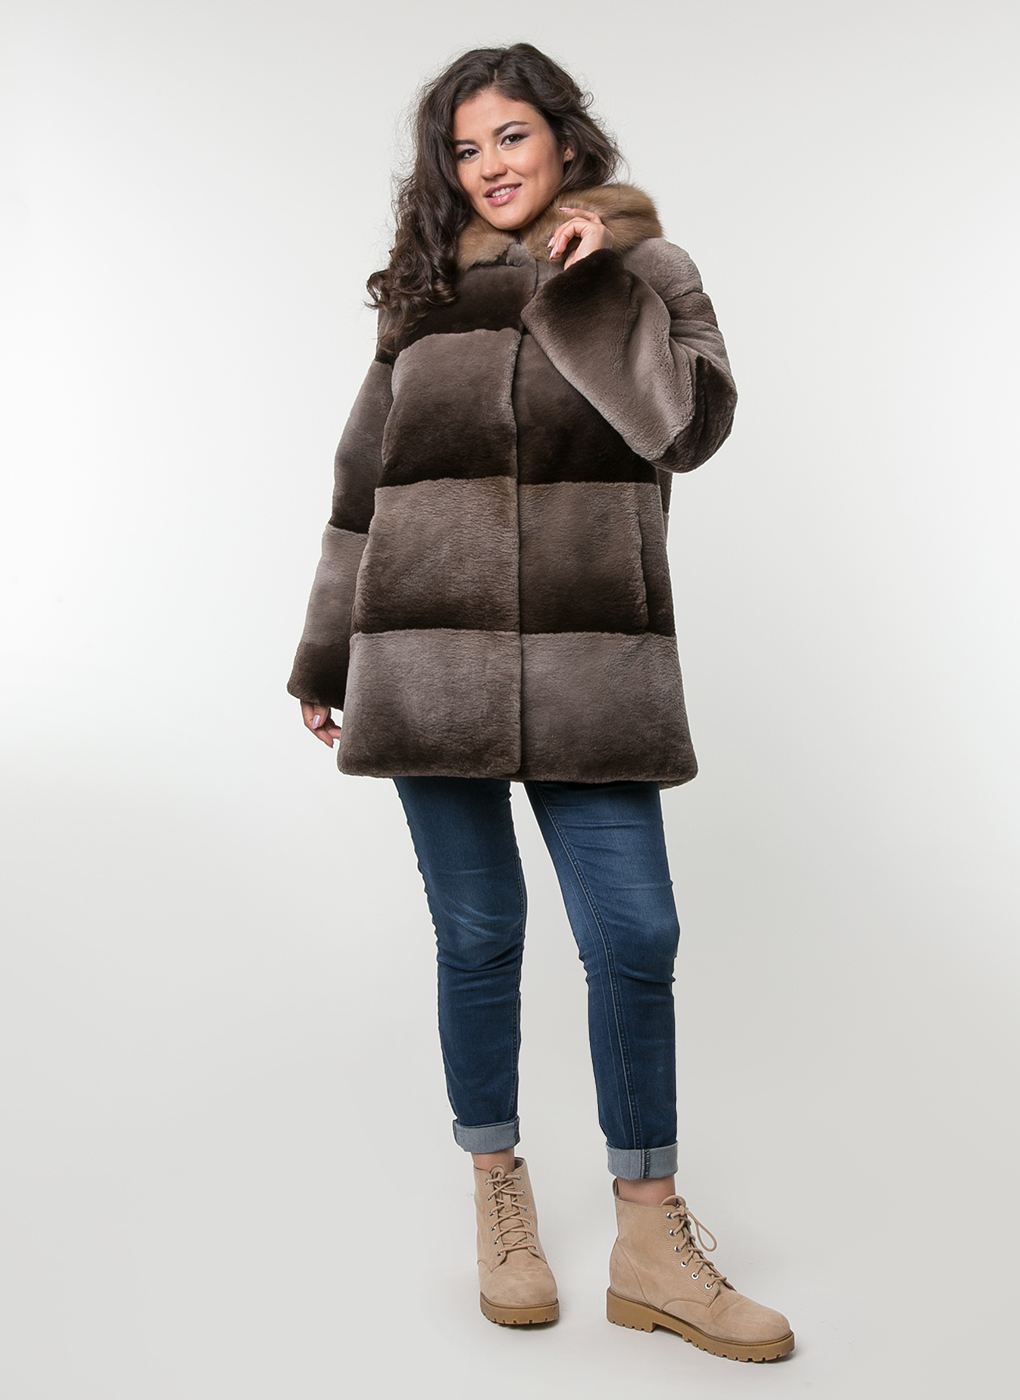 Куртка из бобра Автоледи 04, Лики меха